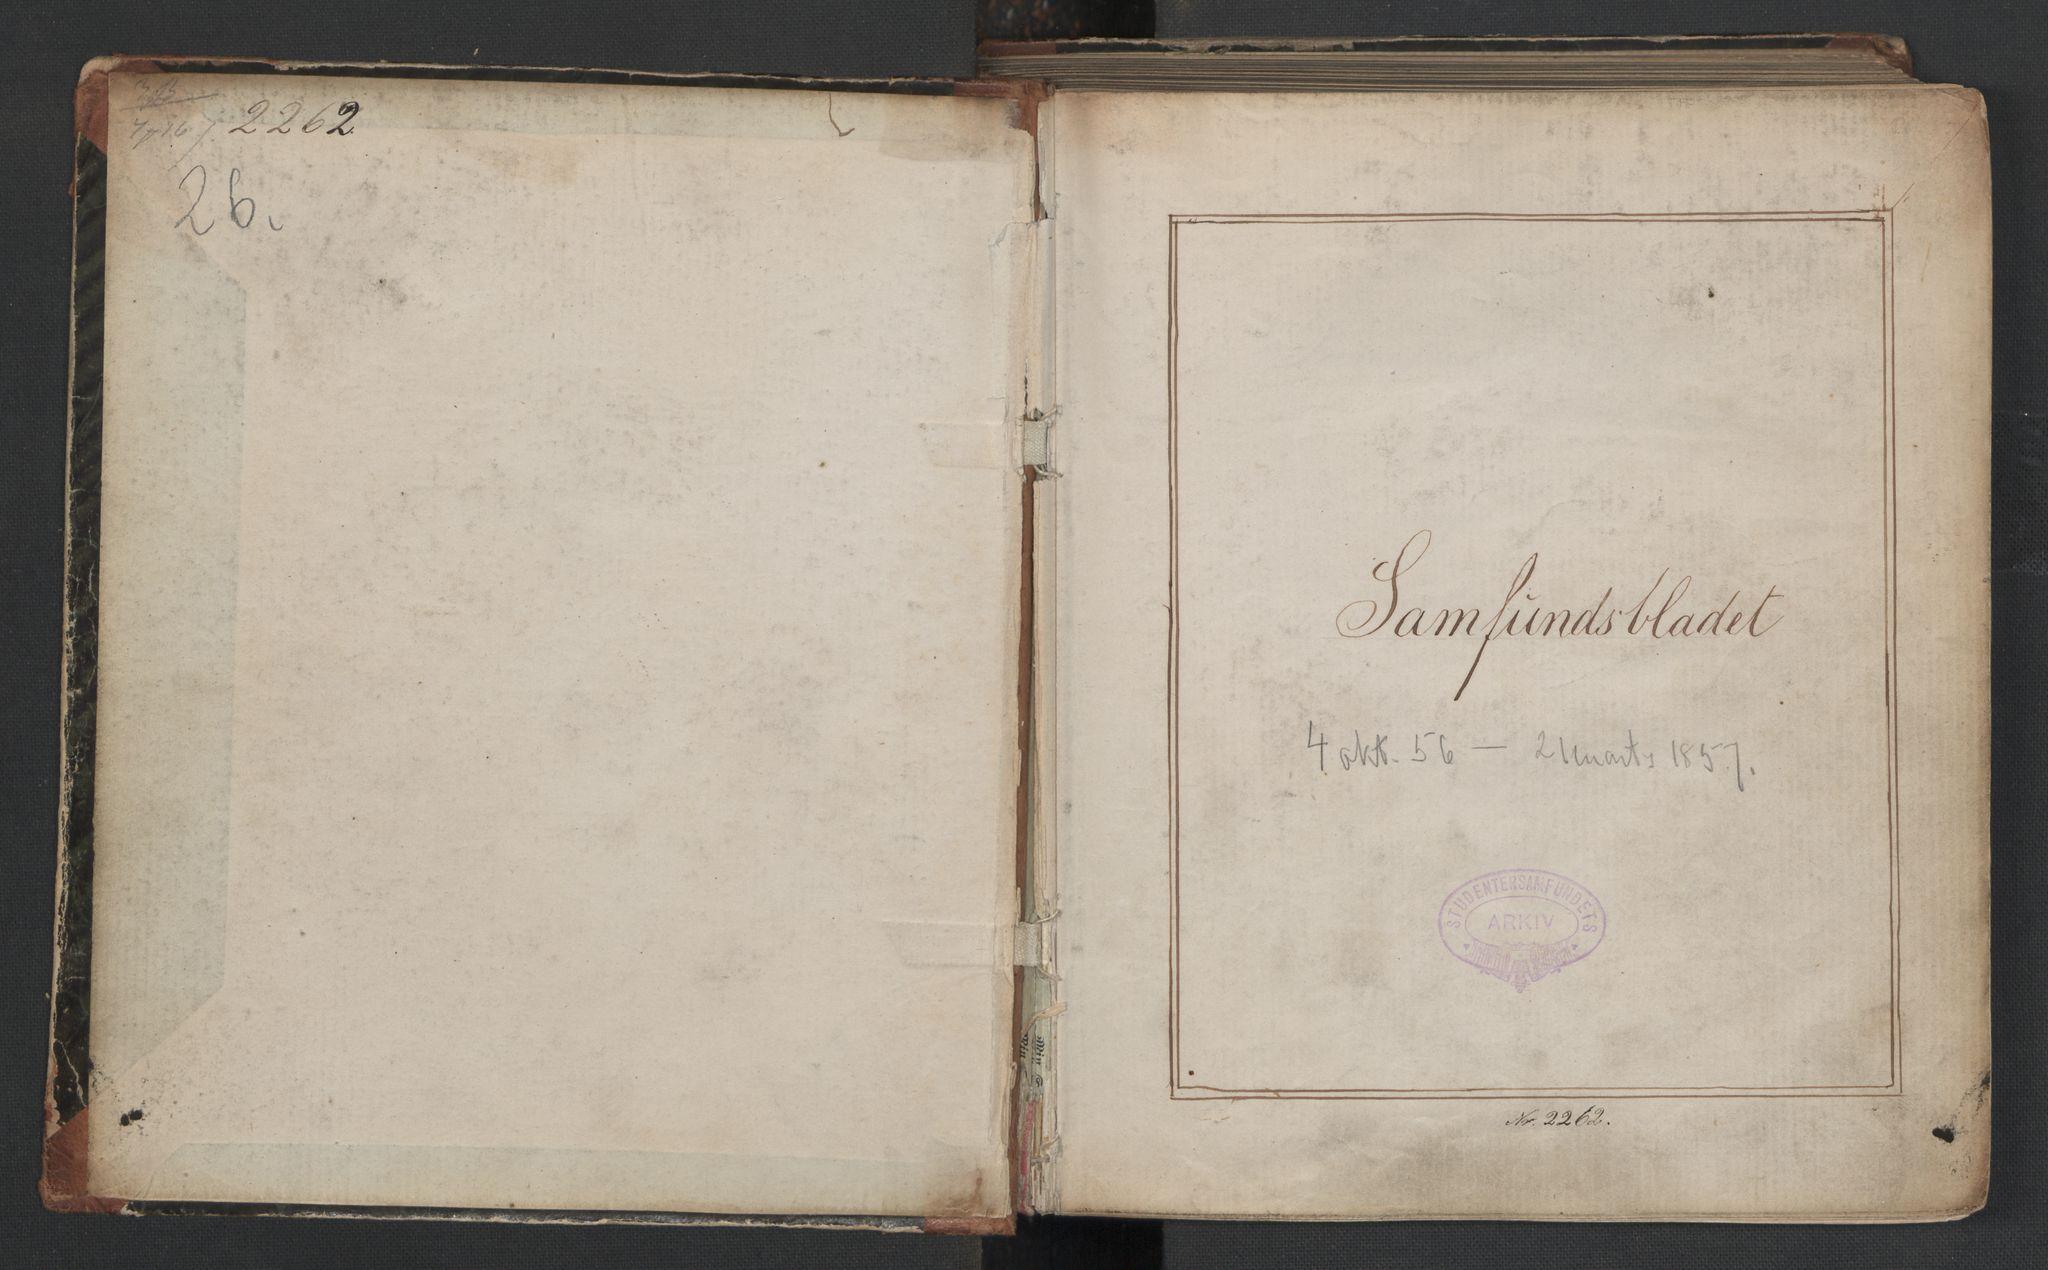 RA, Det Norske Studentersamfund, X/Xa/L0006, 1856-1857, s. 2